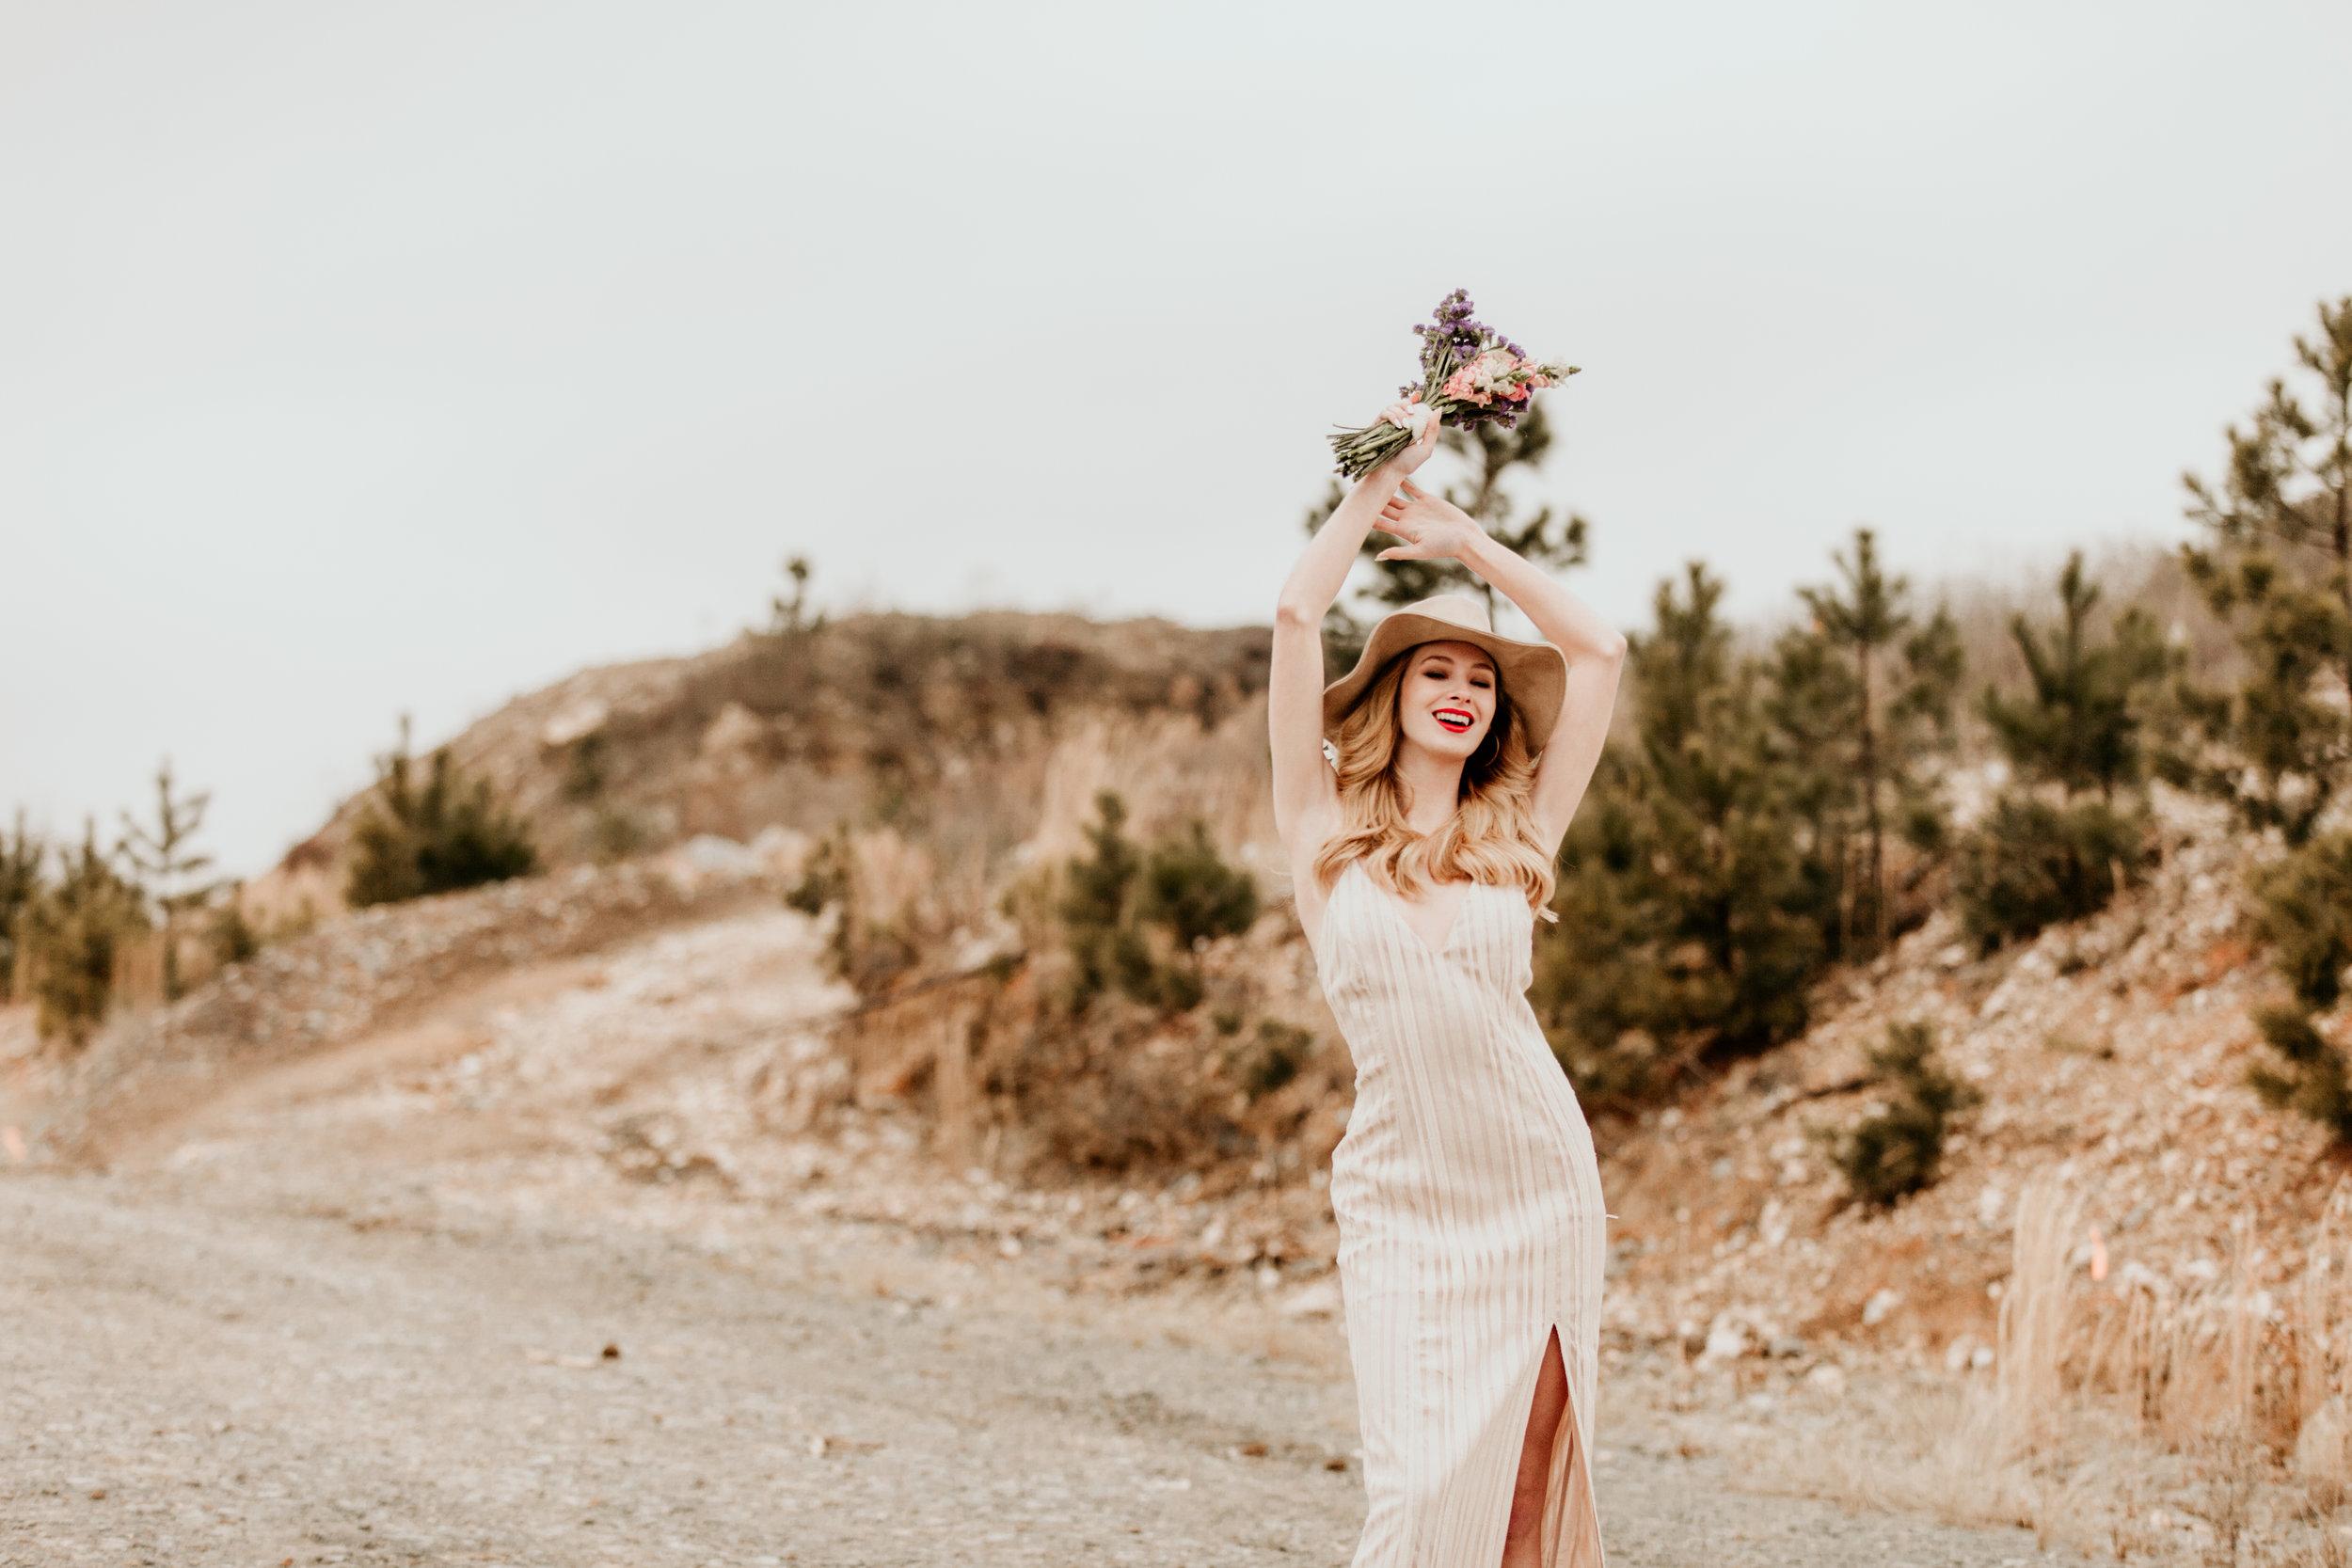 dessert-conway-central-arkansas-bridal-photographer-little-rock-photography-outdoor-wedding-boho-fashion-engagement-elopement-bouquet-bride